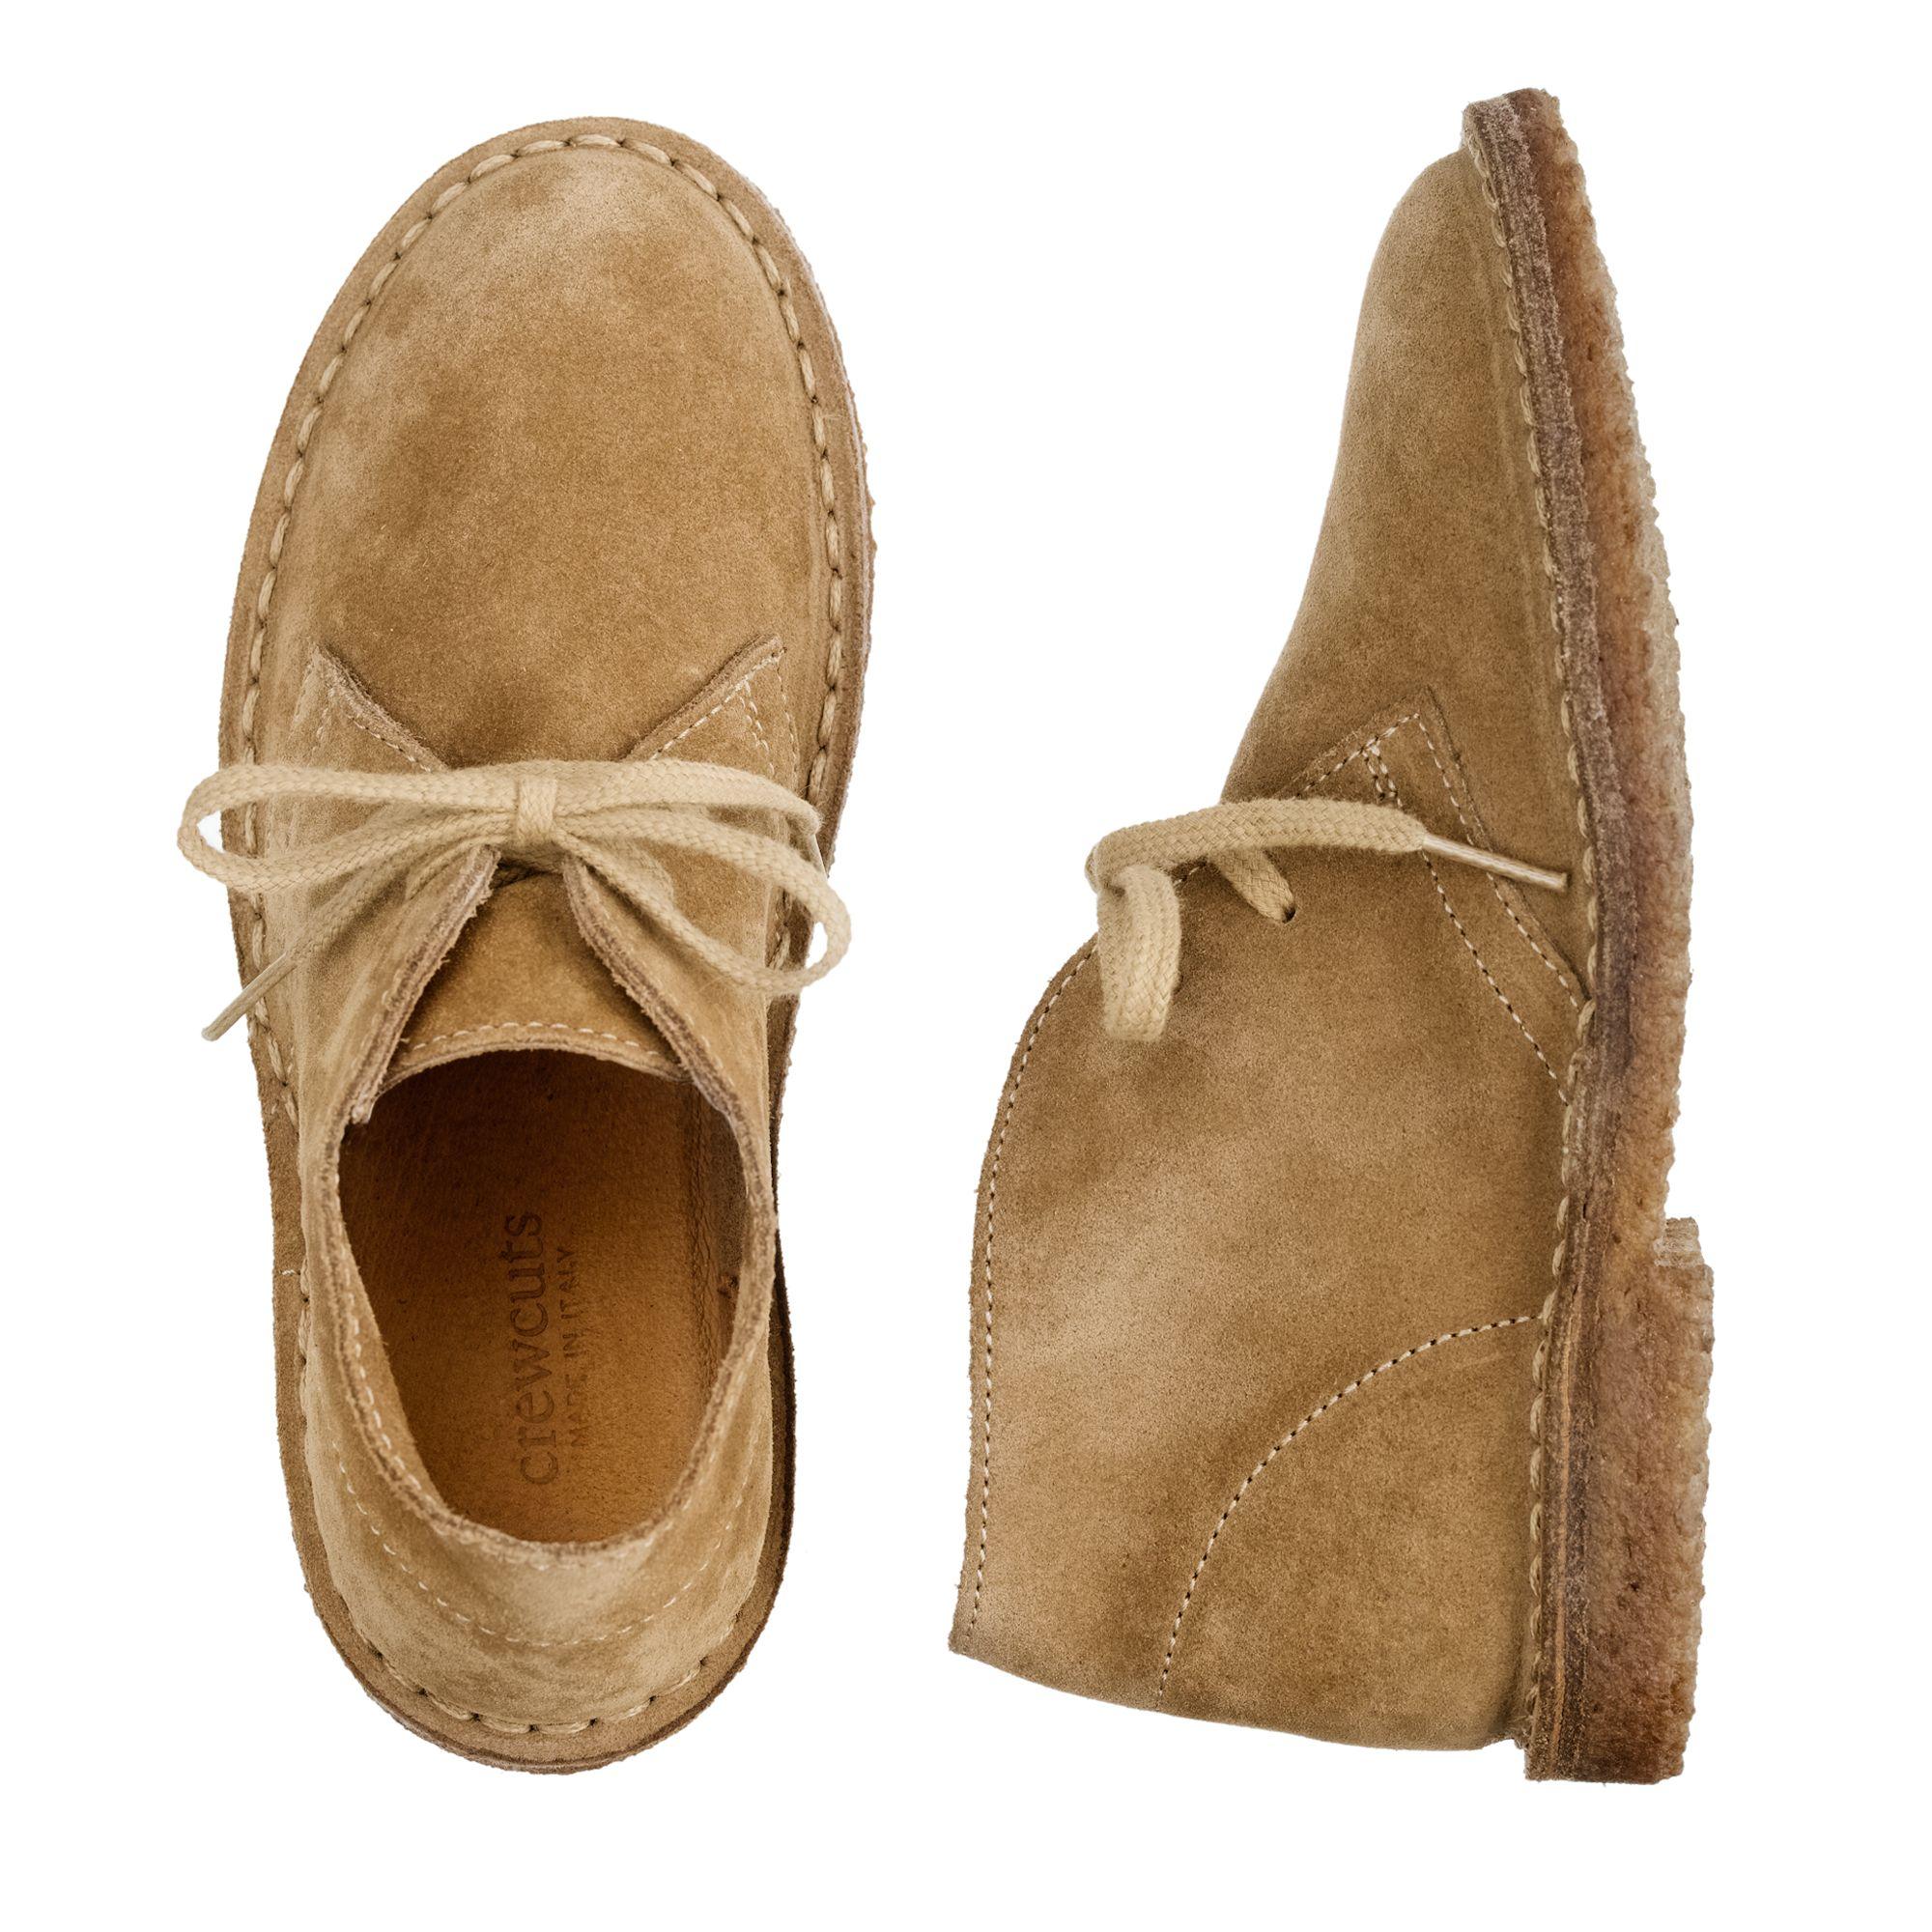 j crew suede macalister boots in beige lyst